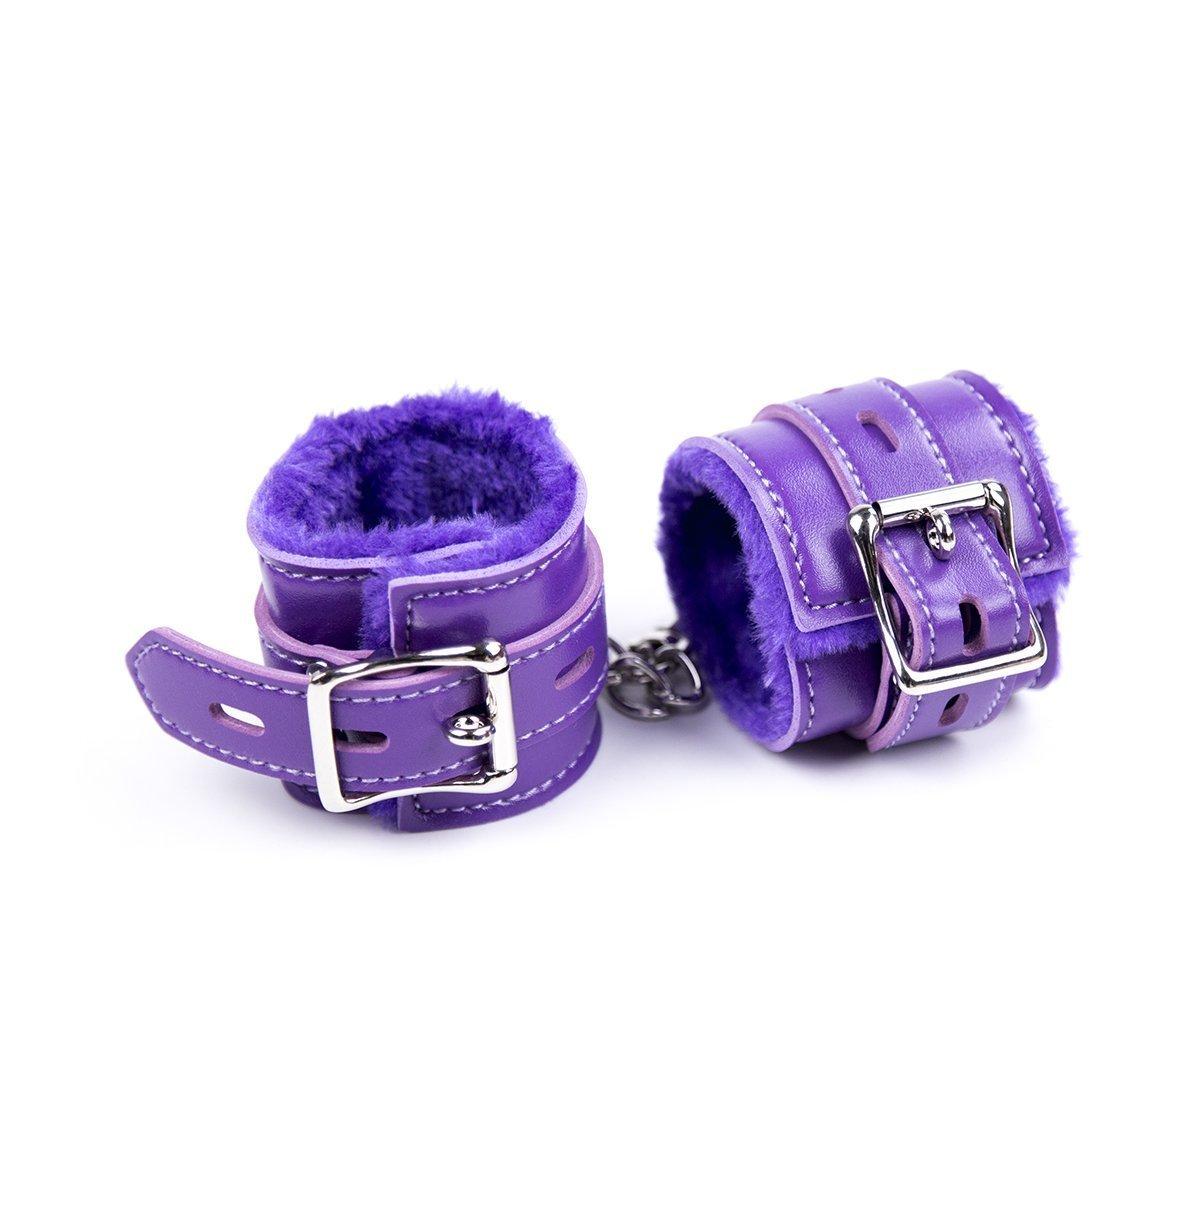 LCC Leather Bondage Restraints Fuzzy Wrist Cuffs Soft Handcuffs